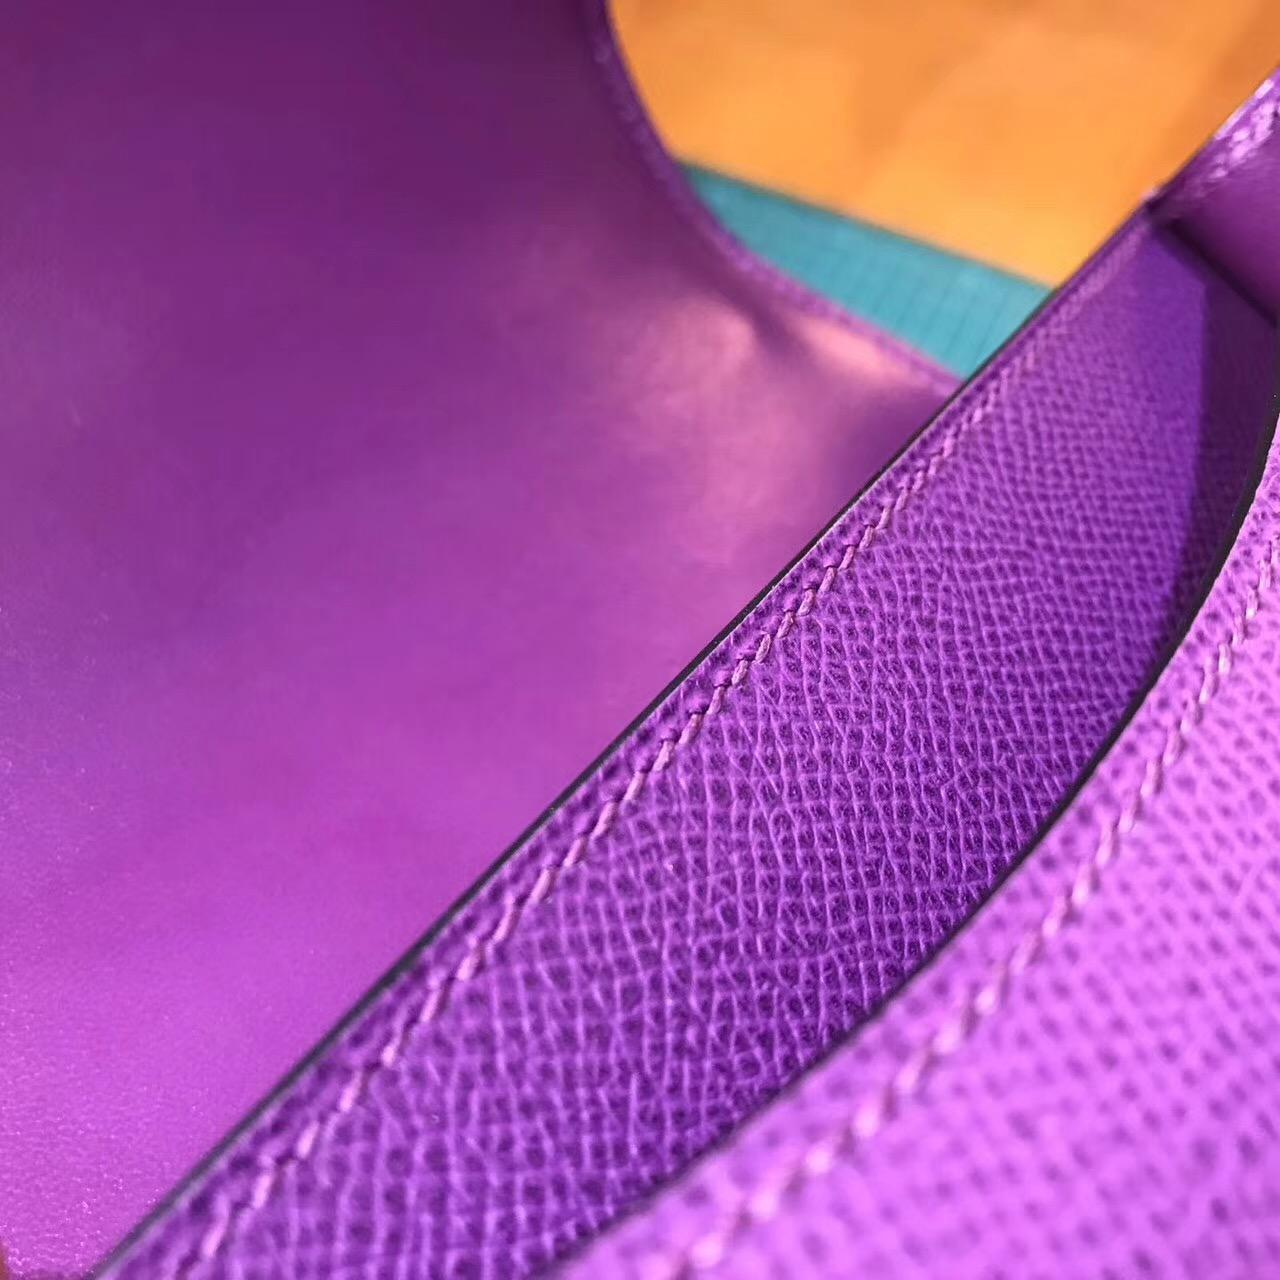 Hermes康斯坦斯包 Constance 18(19)Epsom P9海葵紫 PHW 最美紫色銀扣金屬